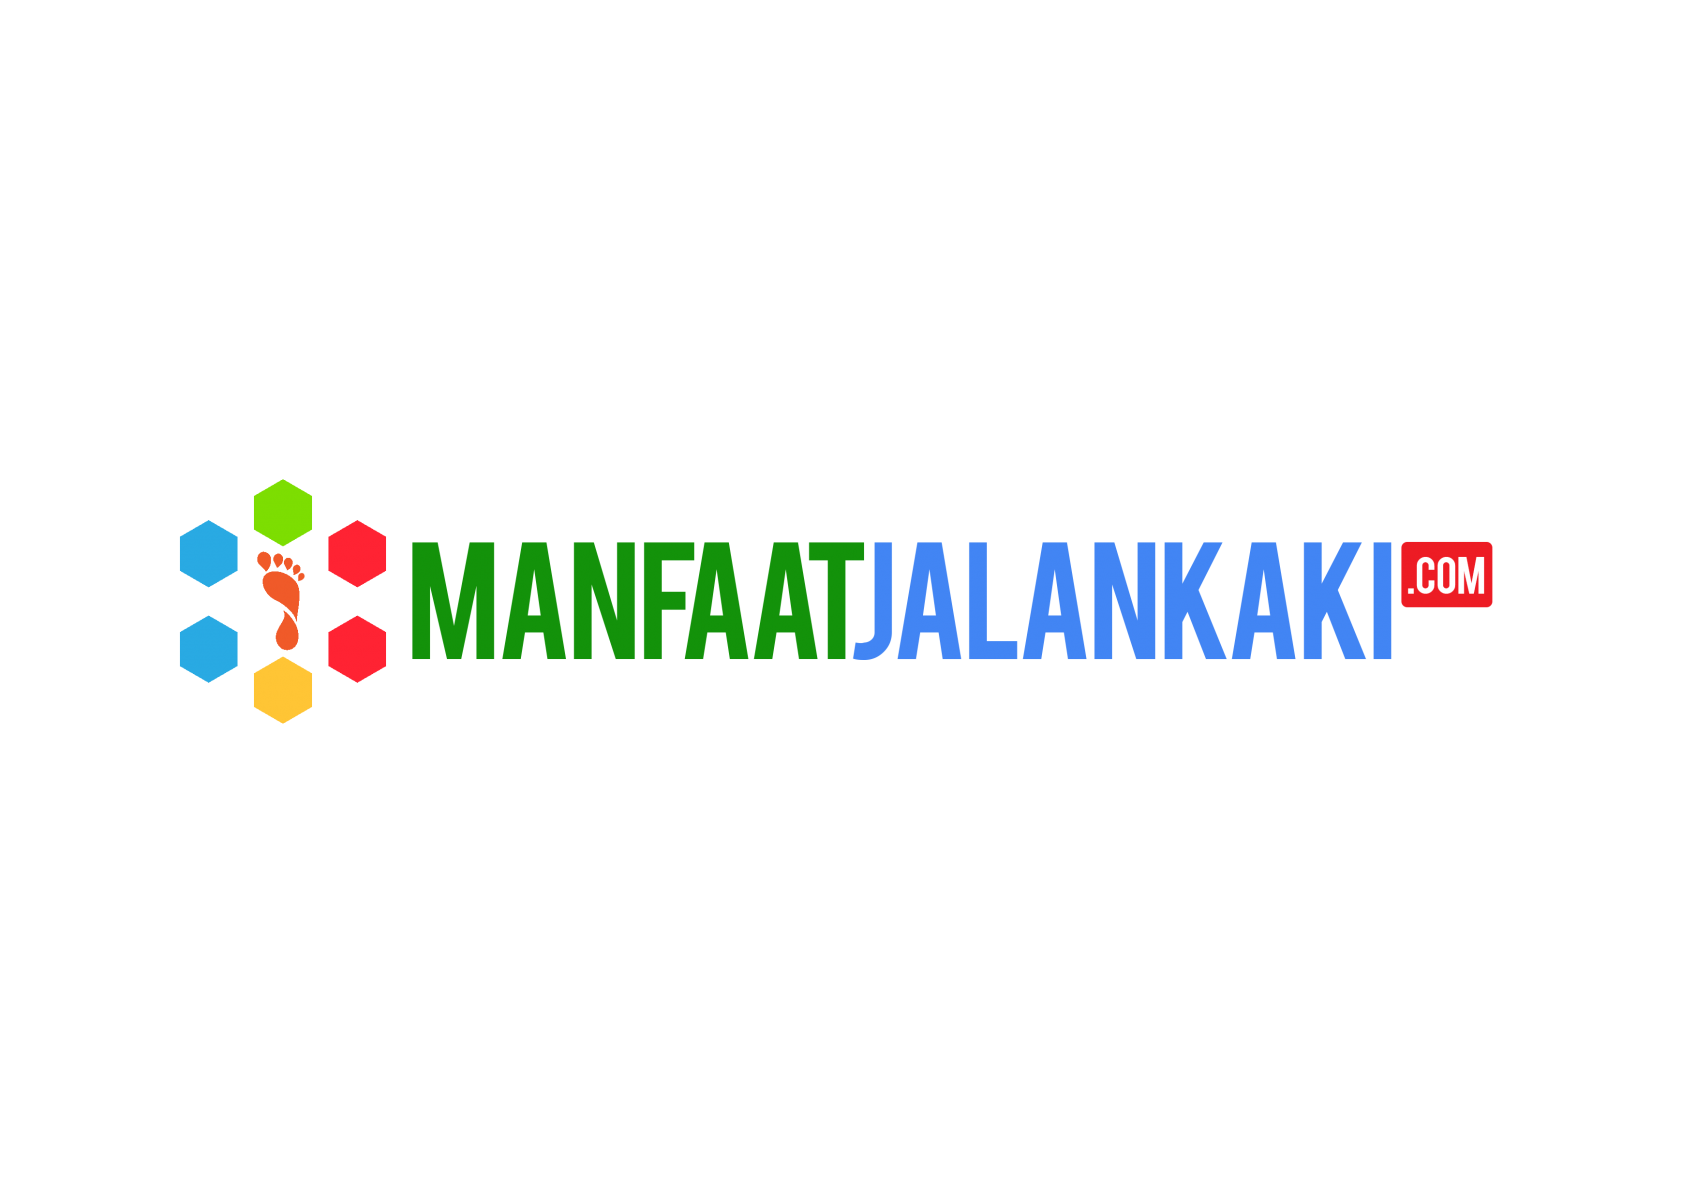 Logo ManfaatJalanKaki.com Desember 2019